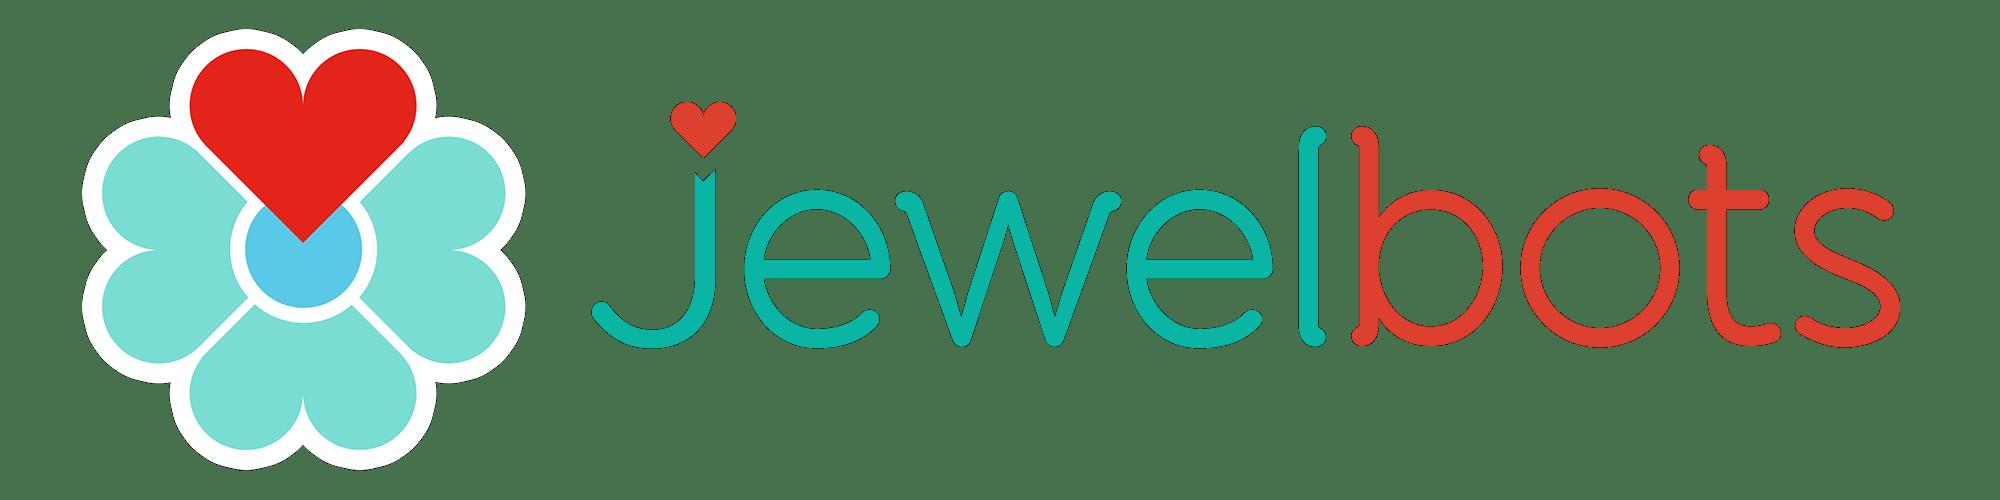 Jewelbots company logo